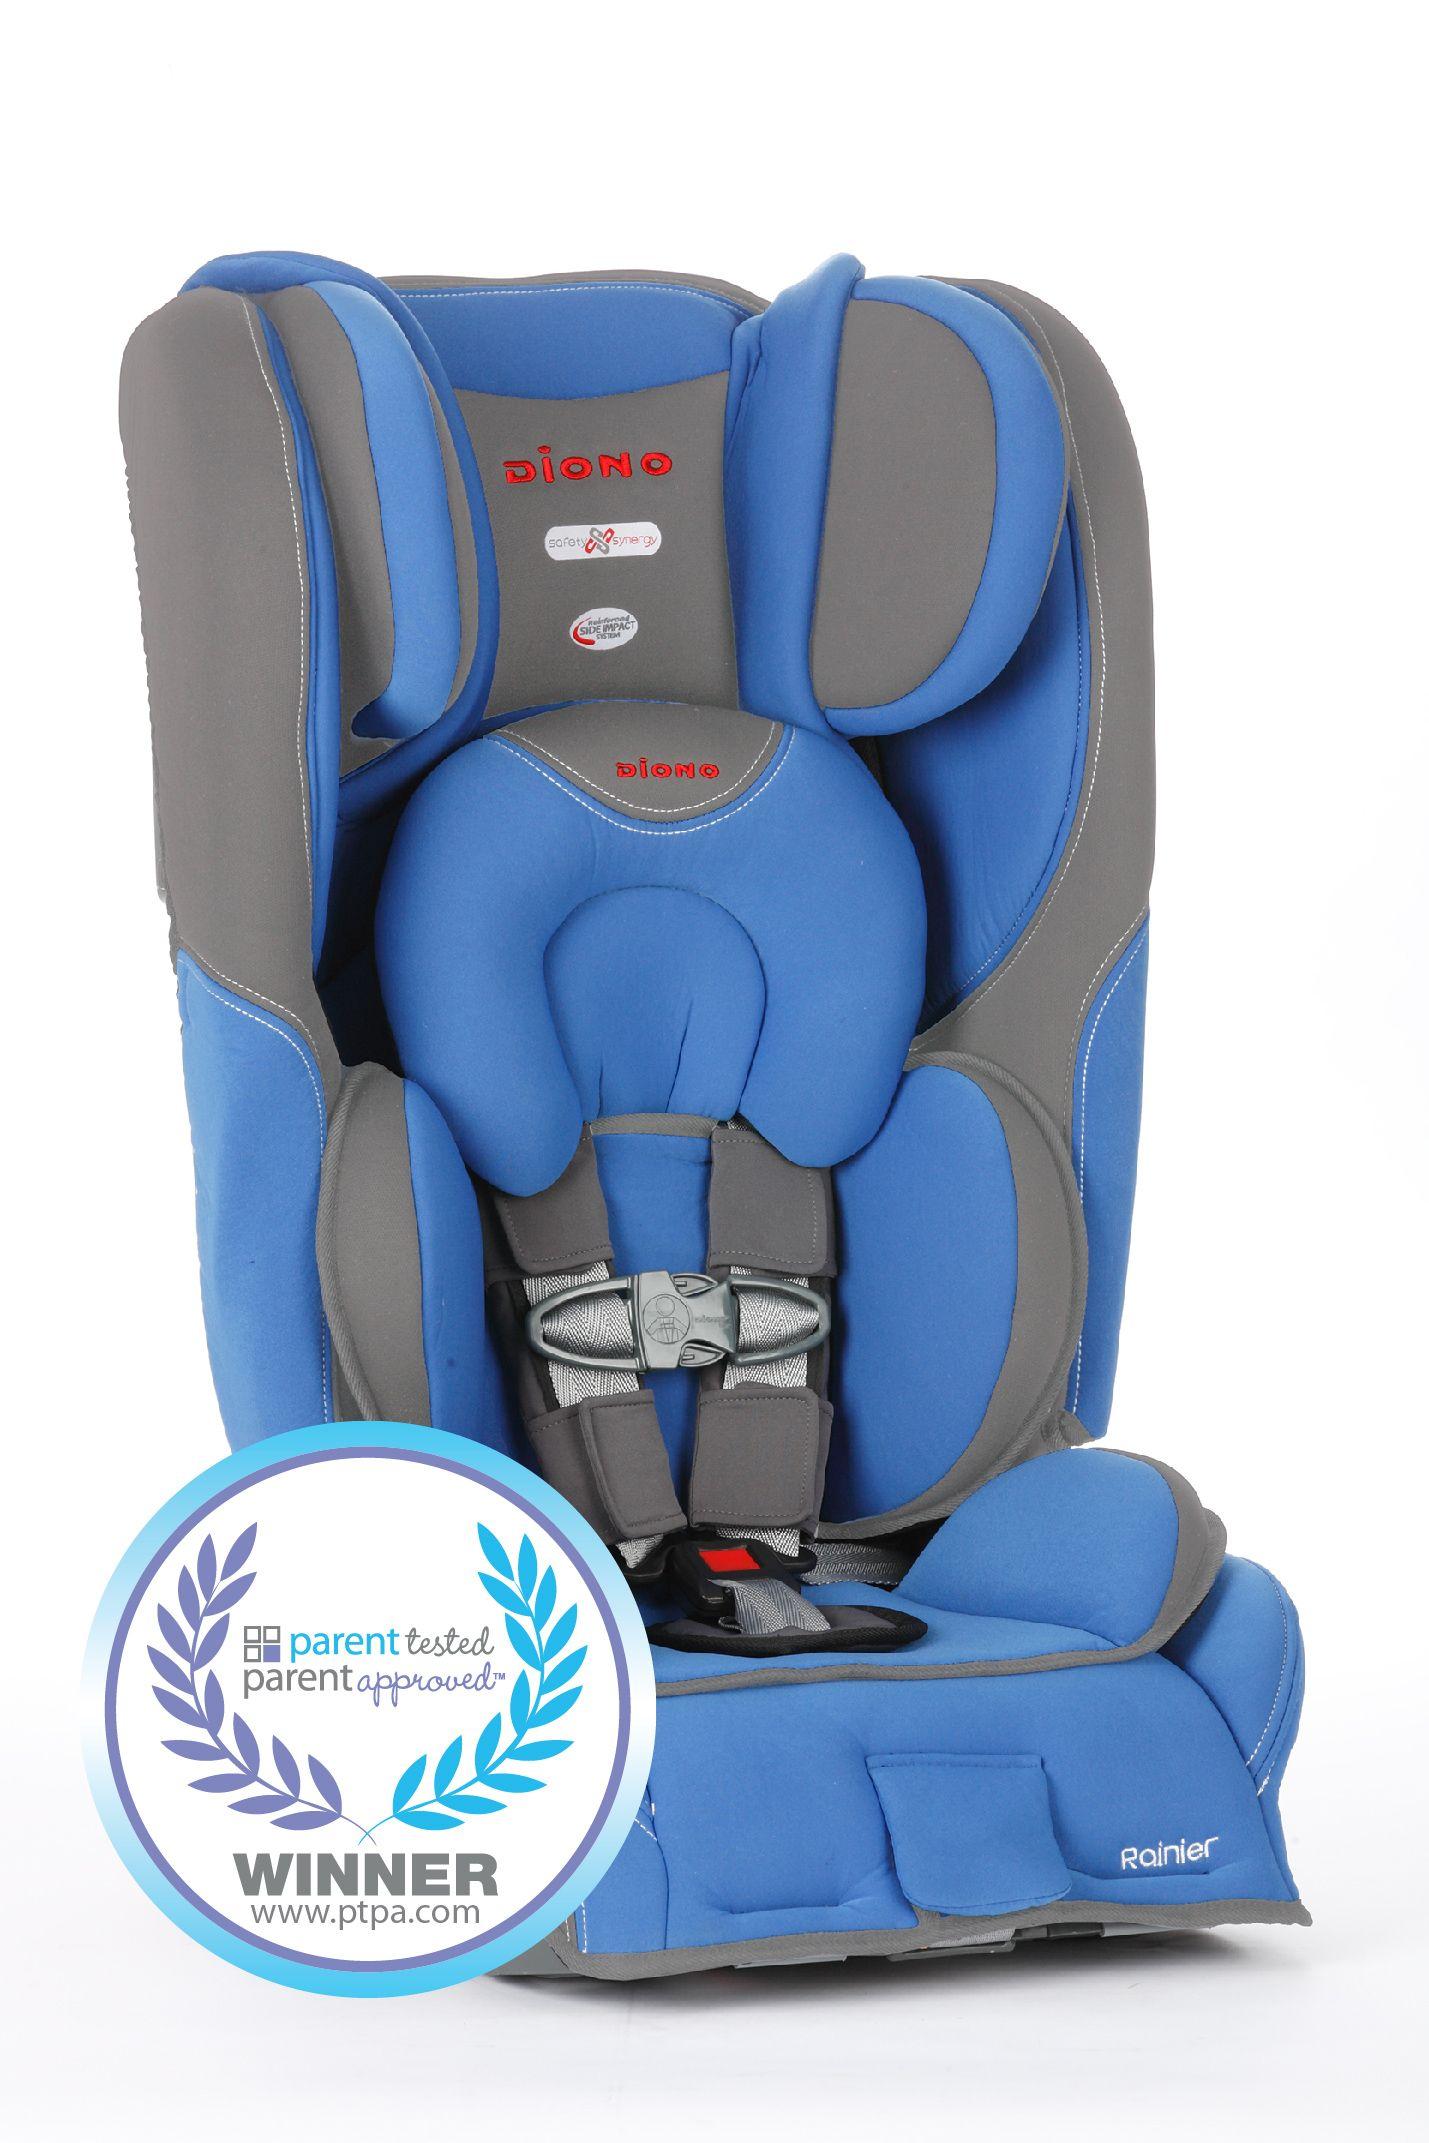 rainier® 2AXT Booster car seat, Car seats, Baby car seats